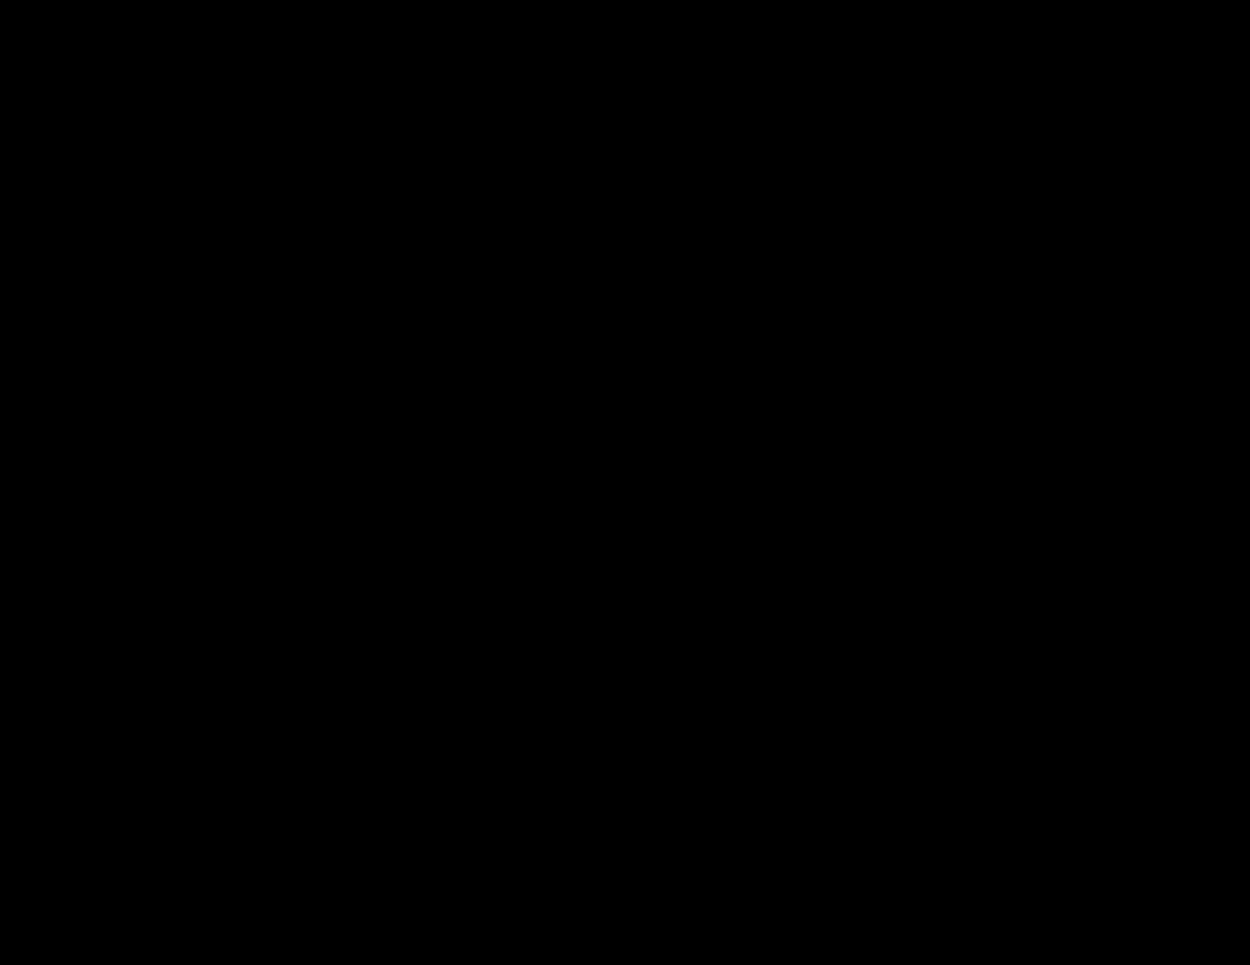 HK Grotesk Open Source Font - Hanken Design Co